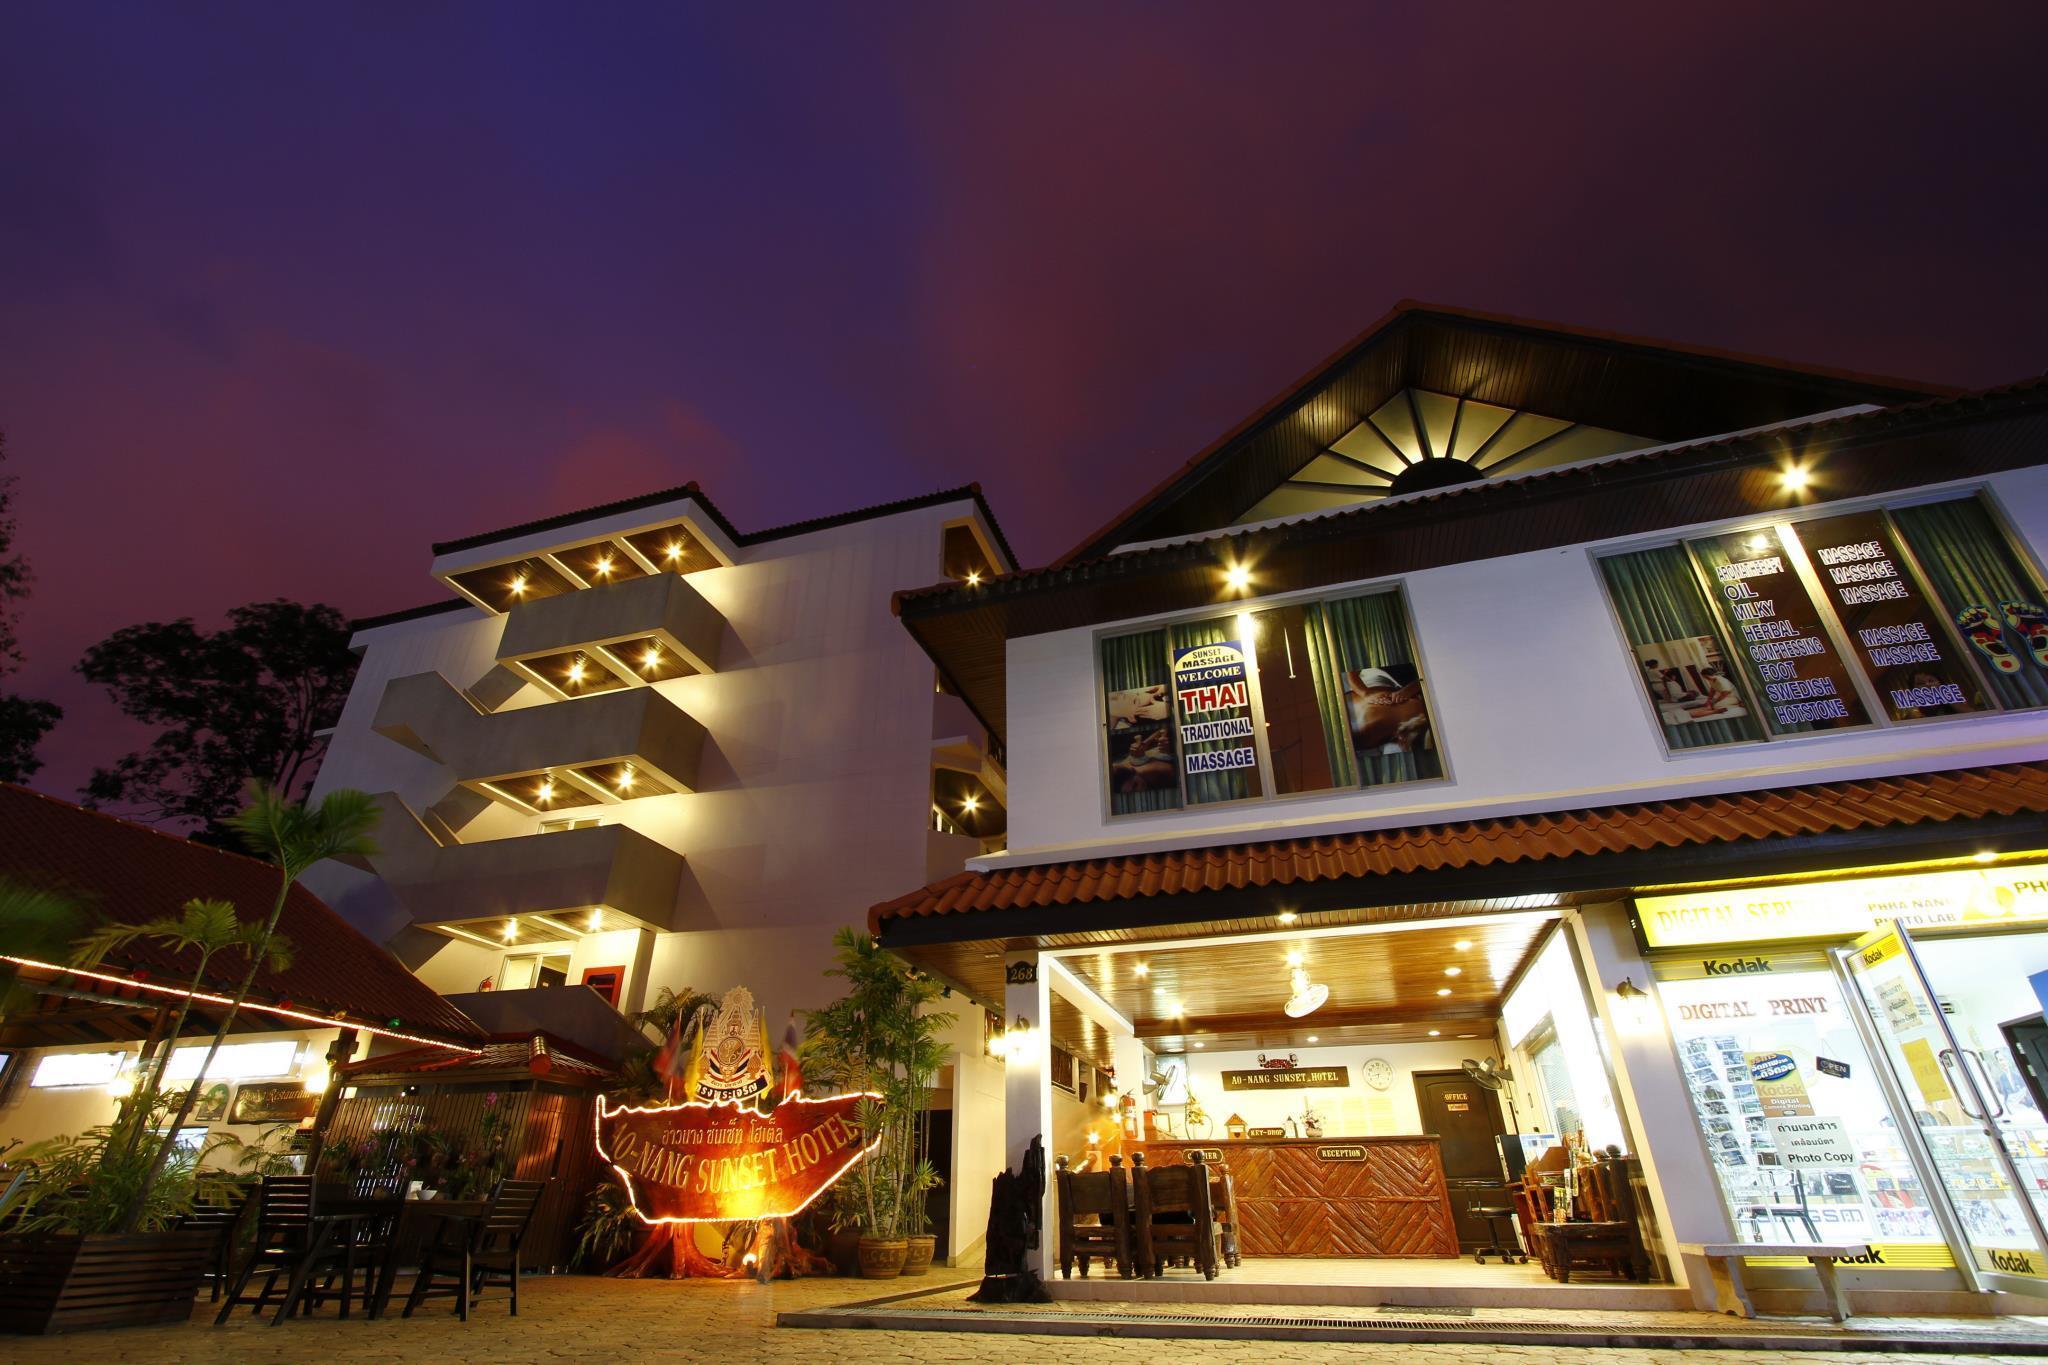 Aonang Sunset Hotel โรงแรมอ่าวนางซันเซ็ท